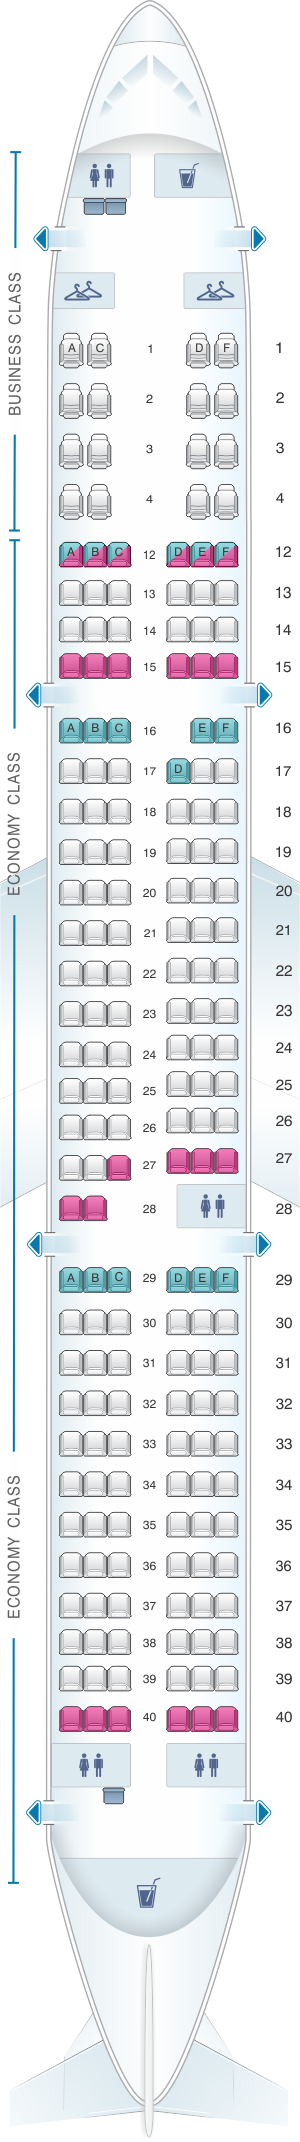 Air Transat A321 Seat Map Wallseat Co